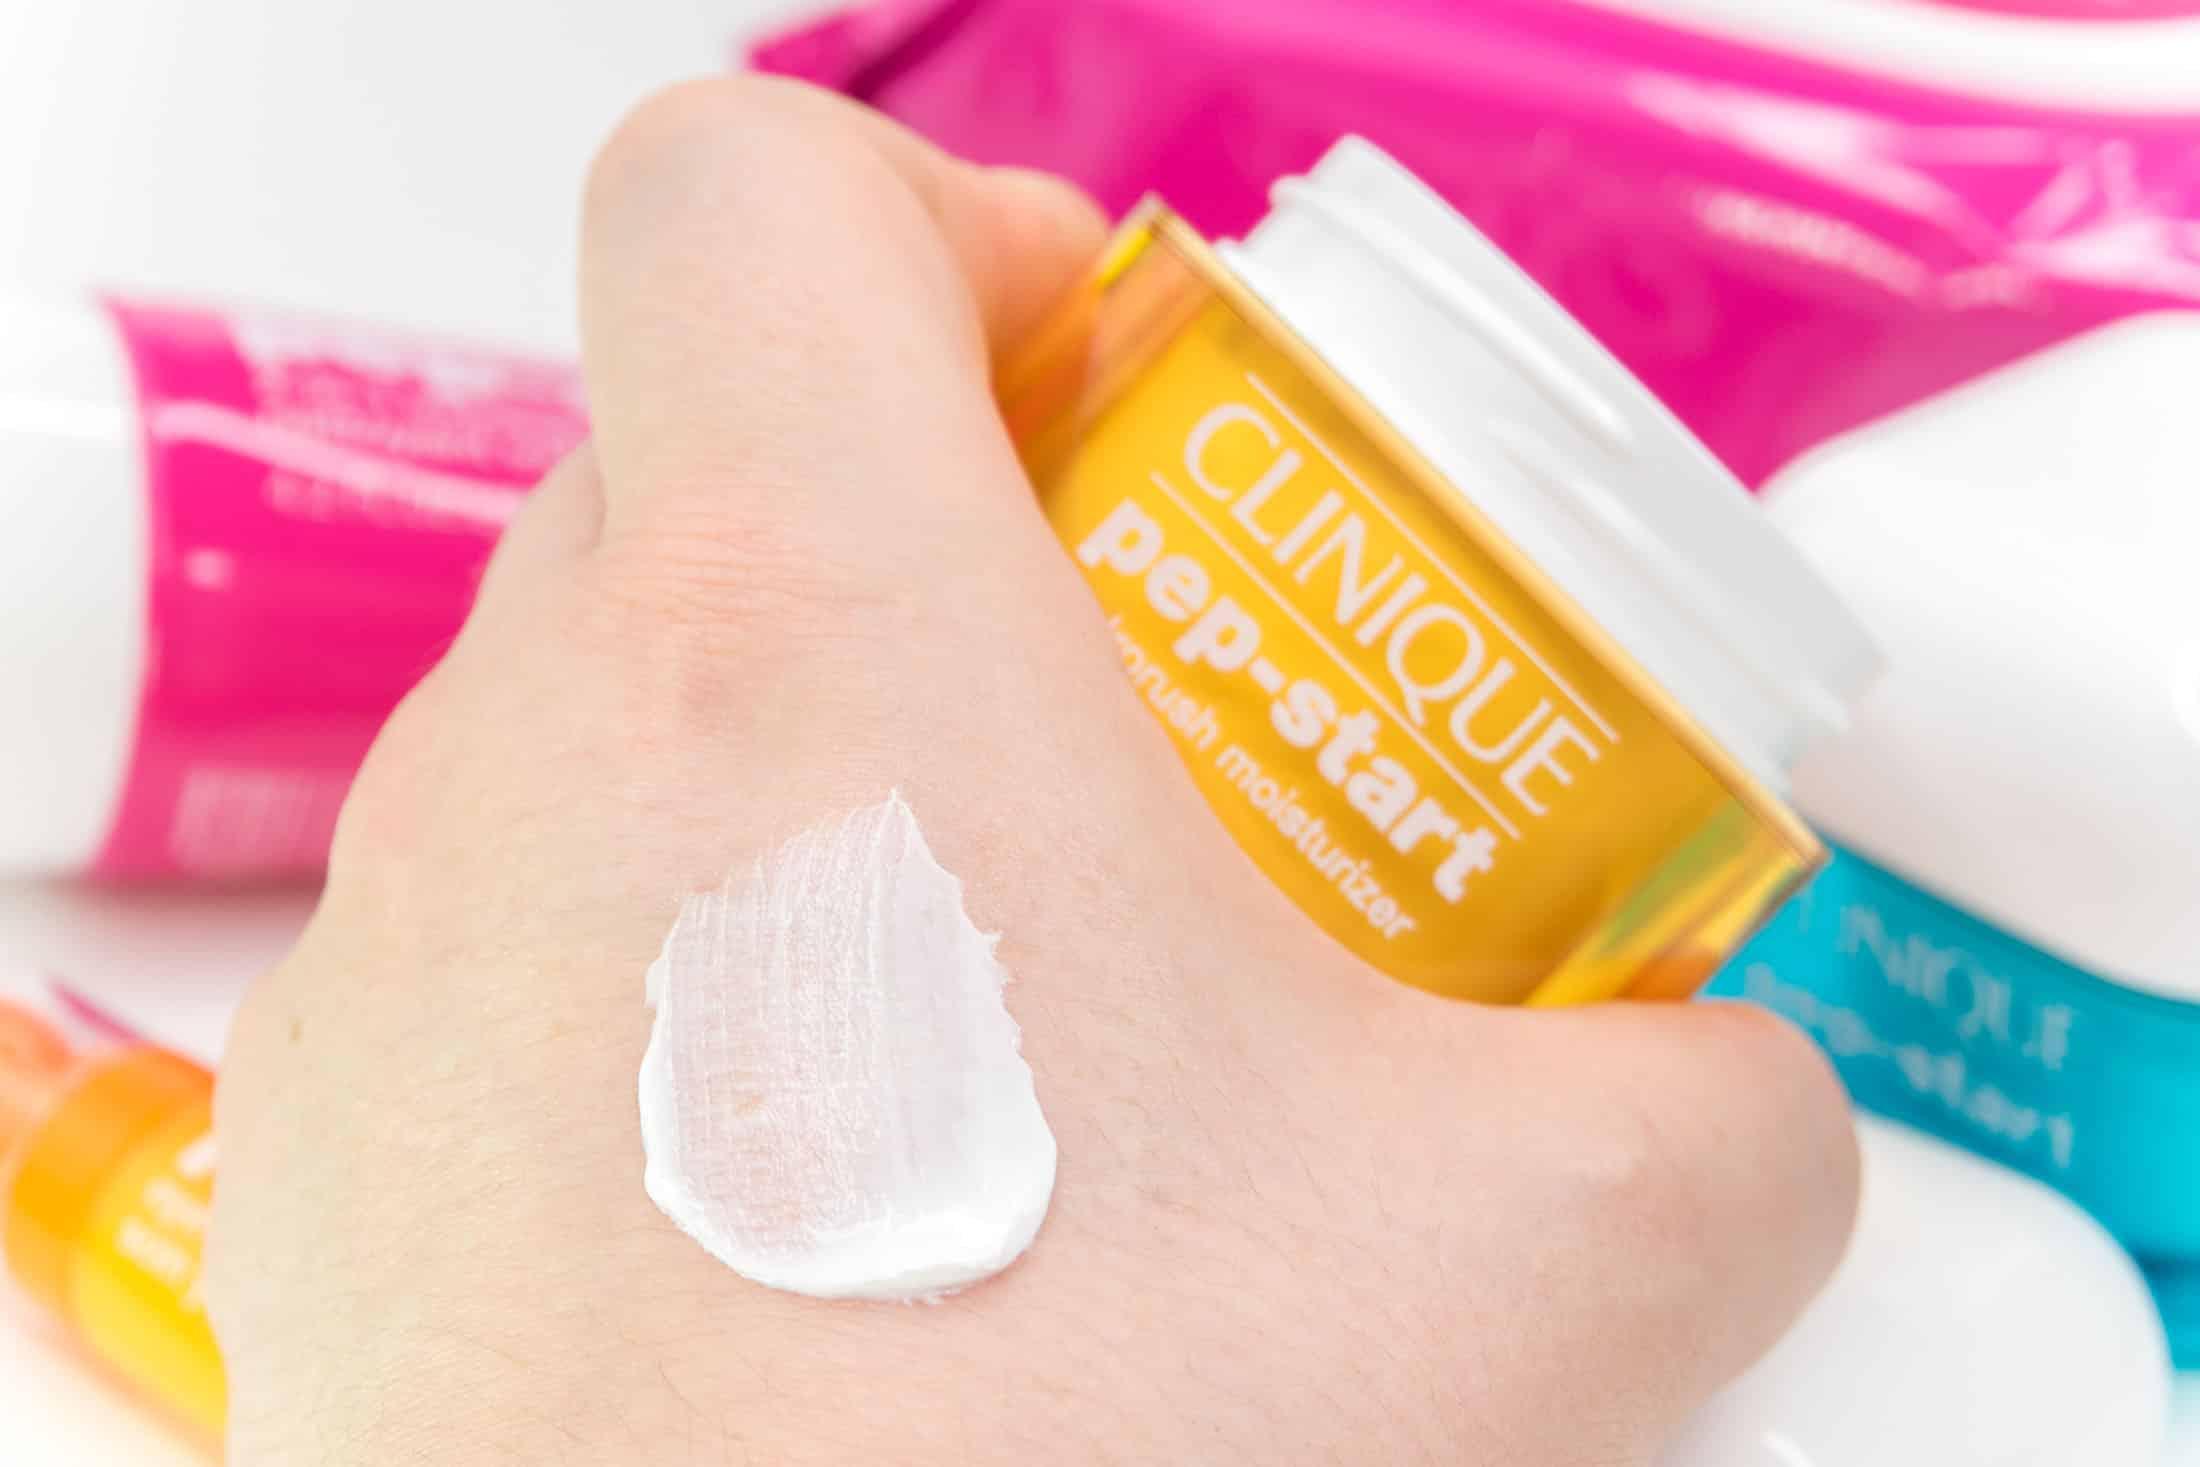 NEW Clinique Pep Start Skincare